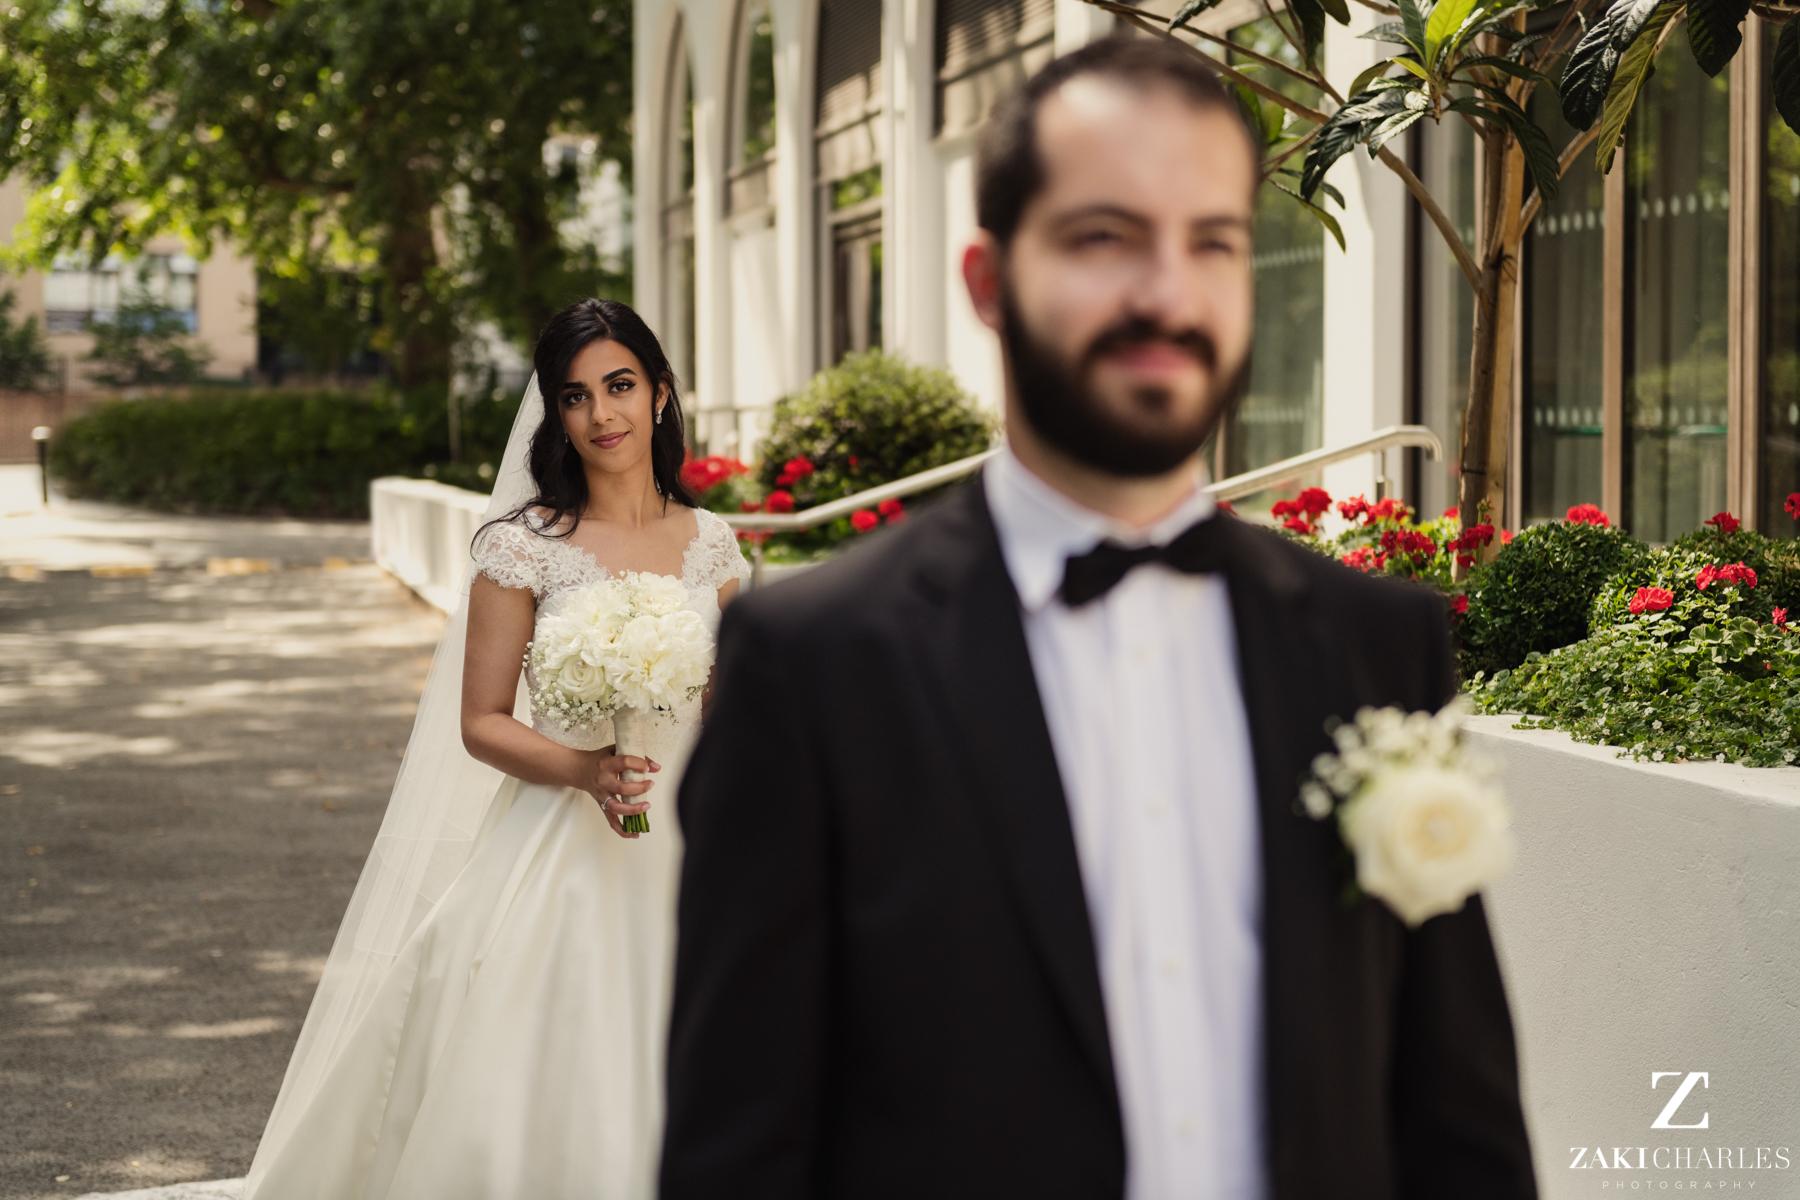 First look between Bride and Groom 3